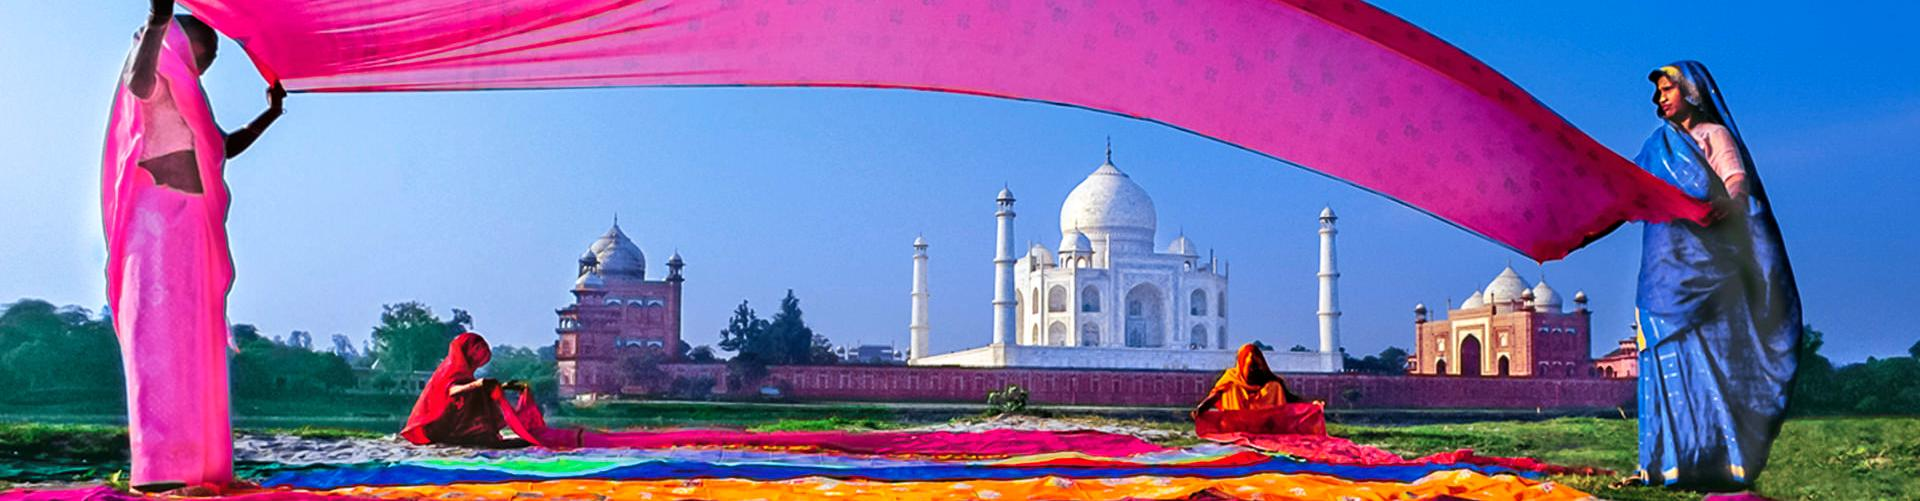 Taj Mahal. Indien mit Gebeco Reisen